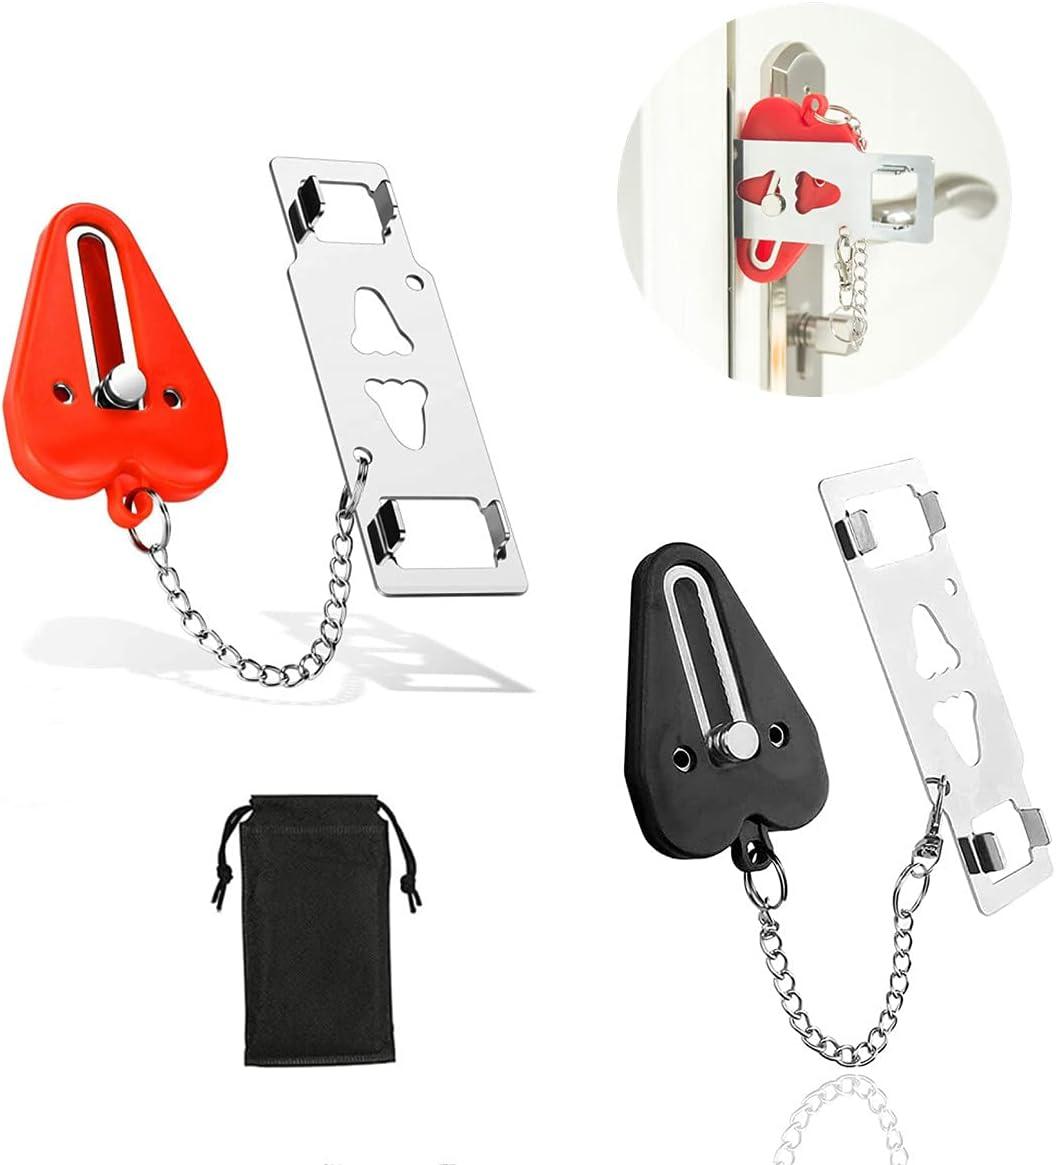 WEGXINNA Portable Door Lock 2 Ext Pack New mail order Financial sales sale Home Security Locker